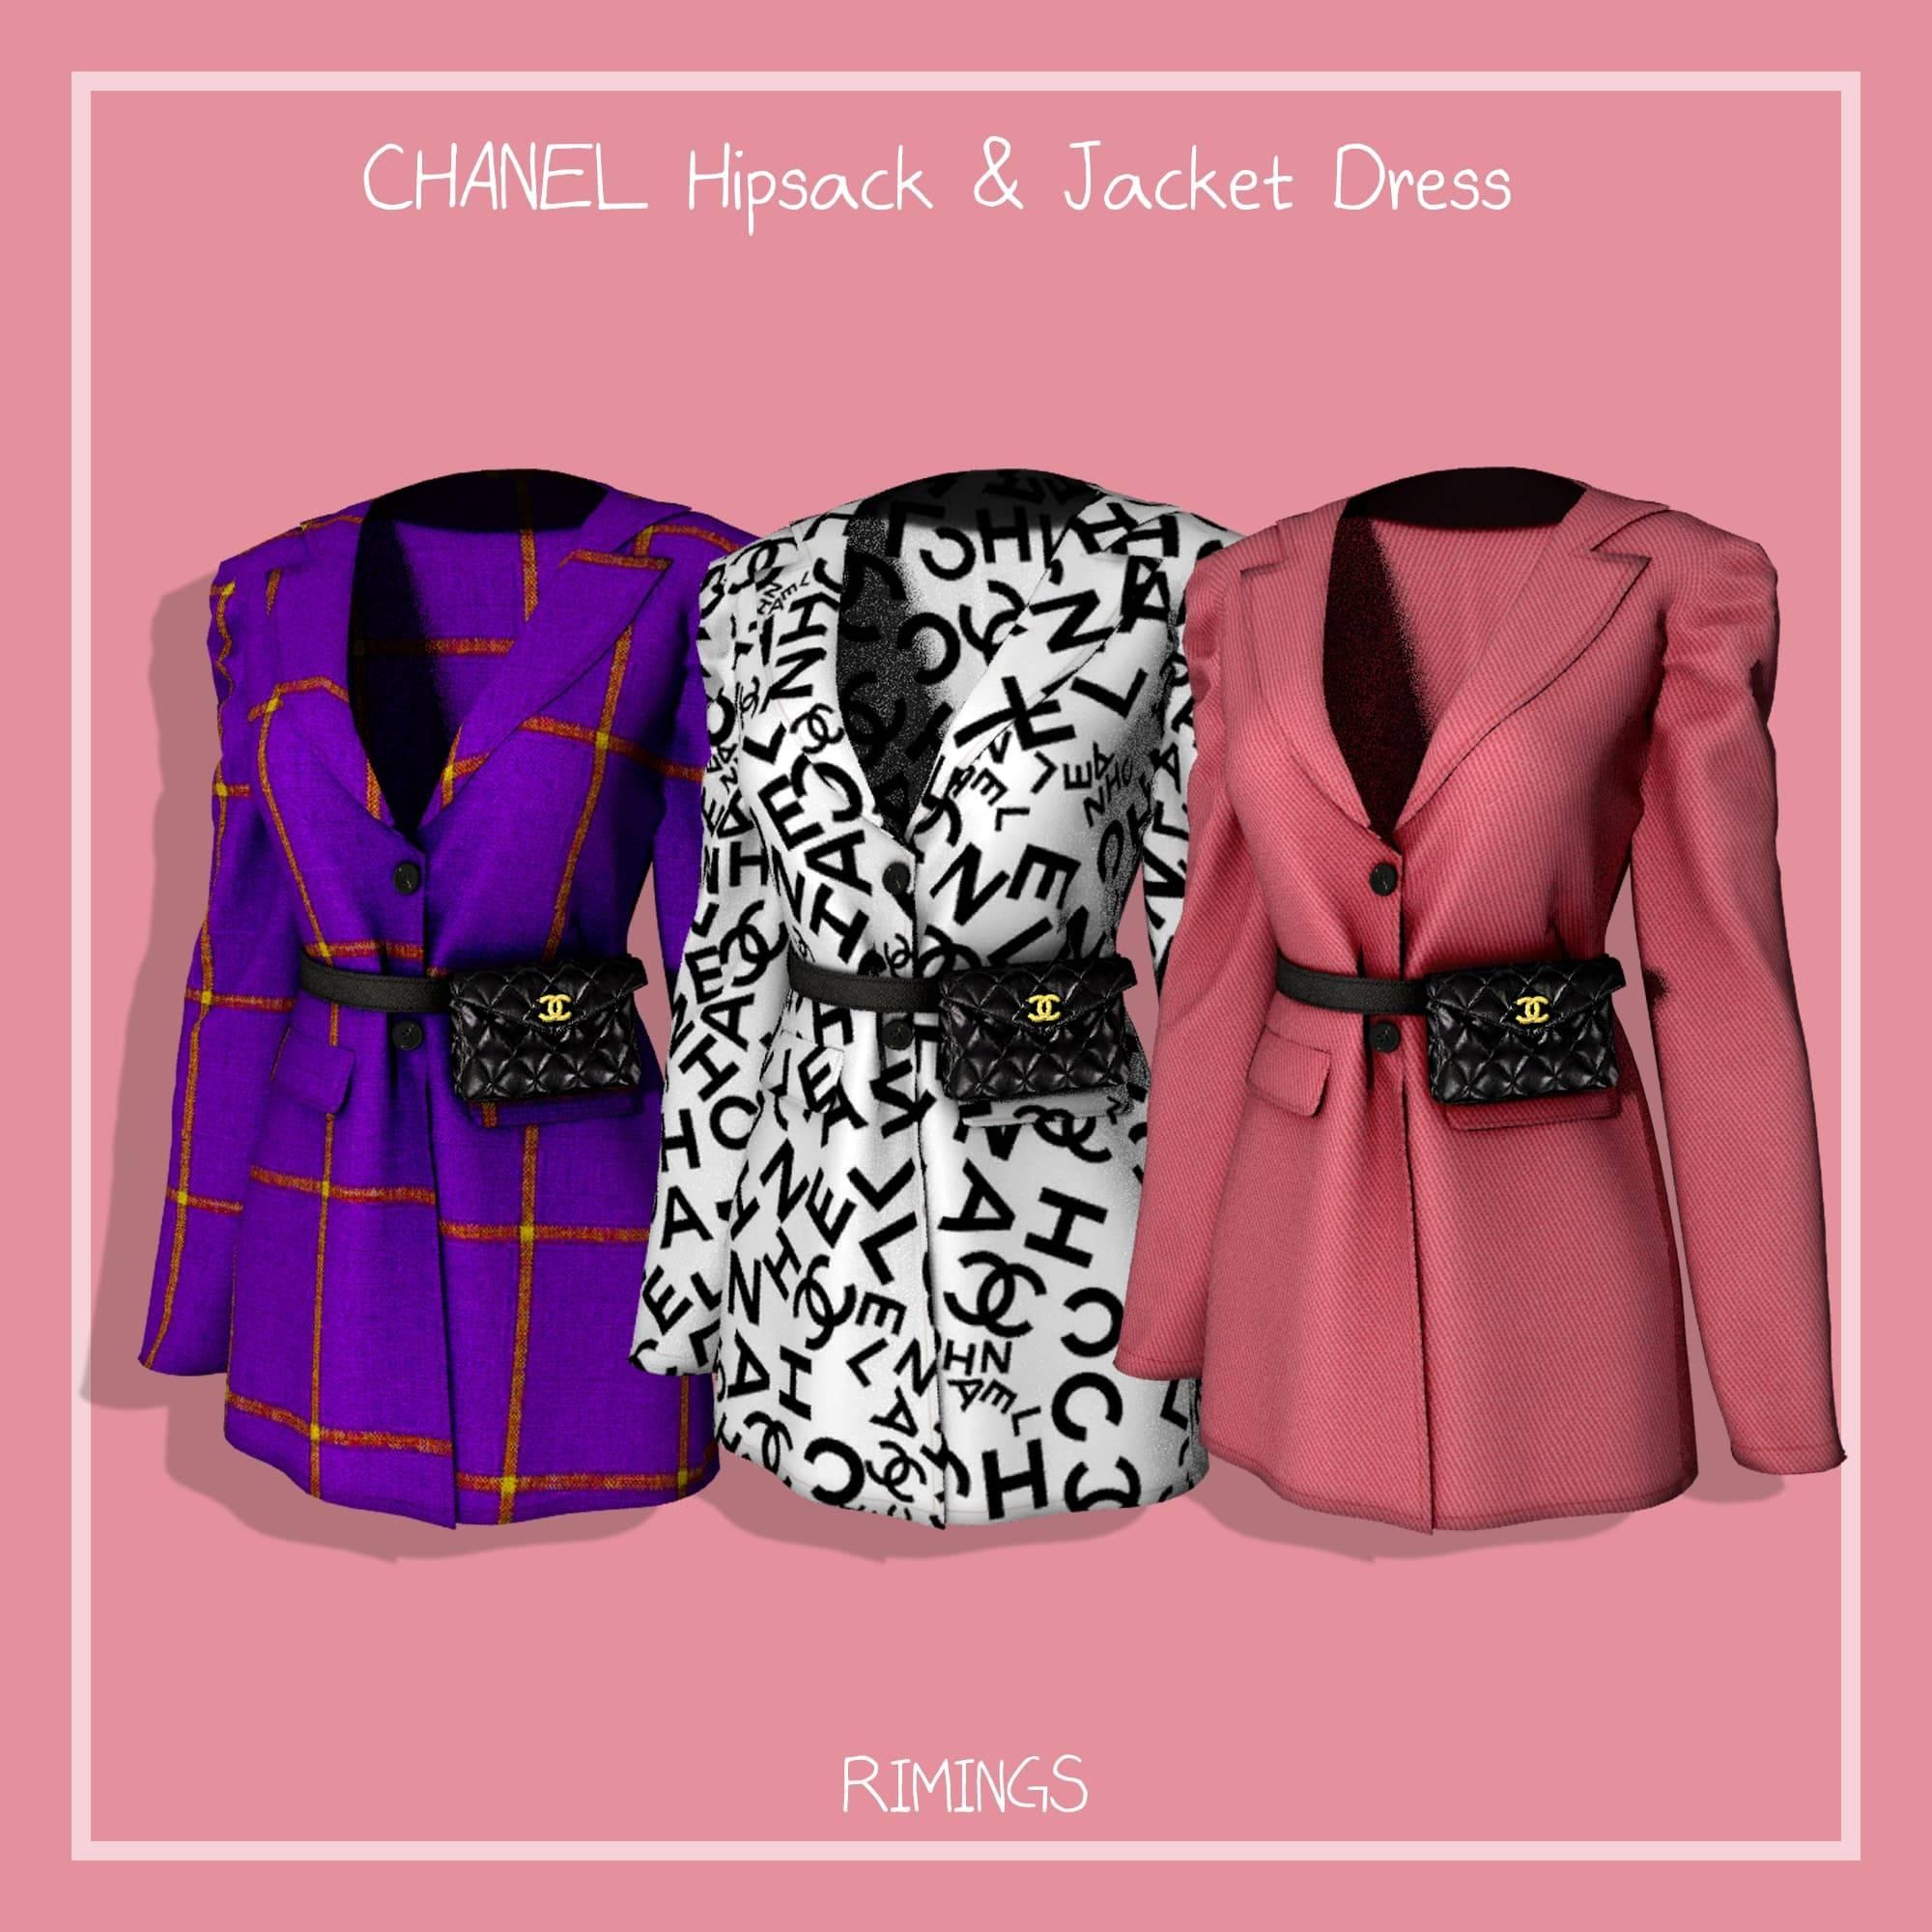 Женский пиджак - CHANEL Hipsack and Jacket Dress